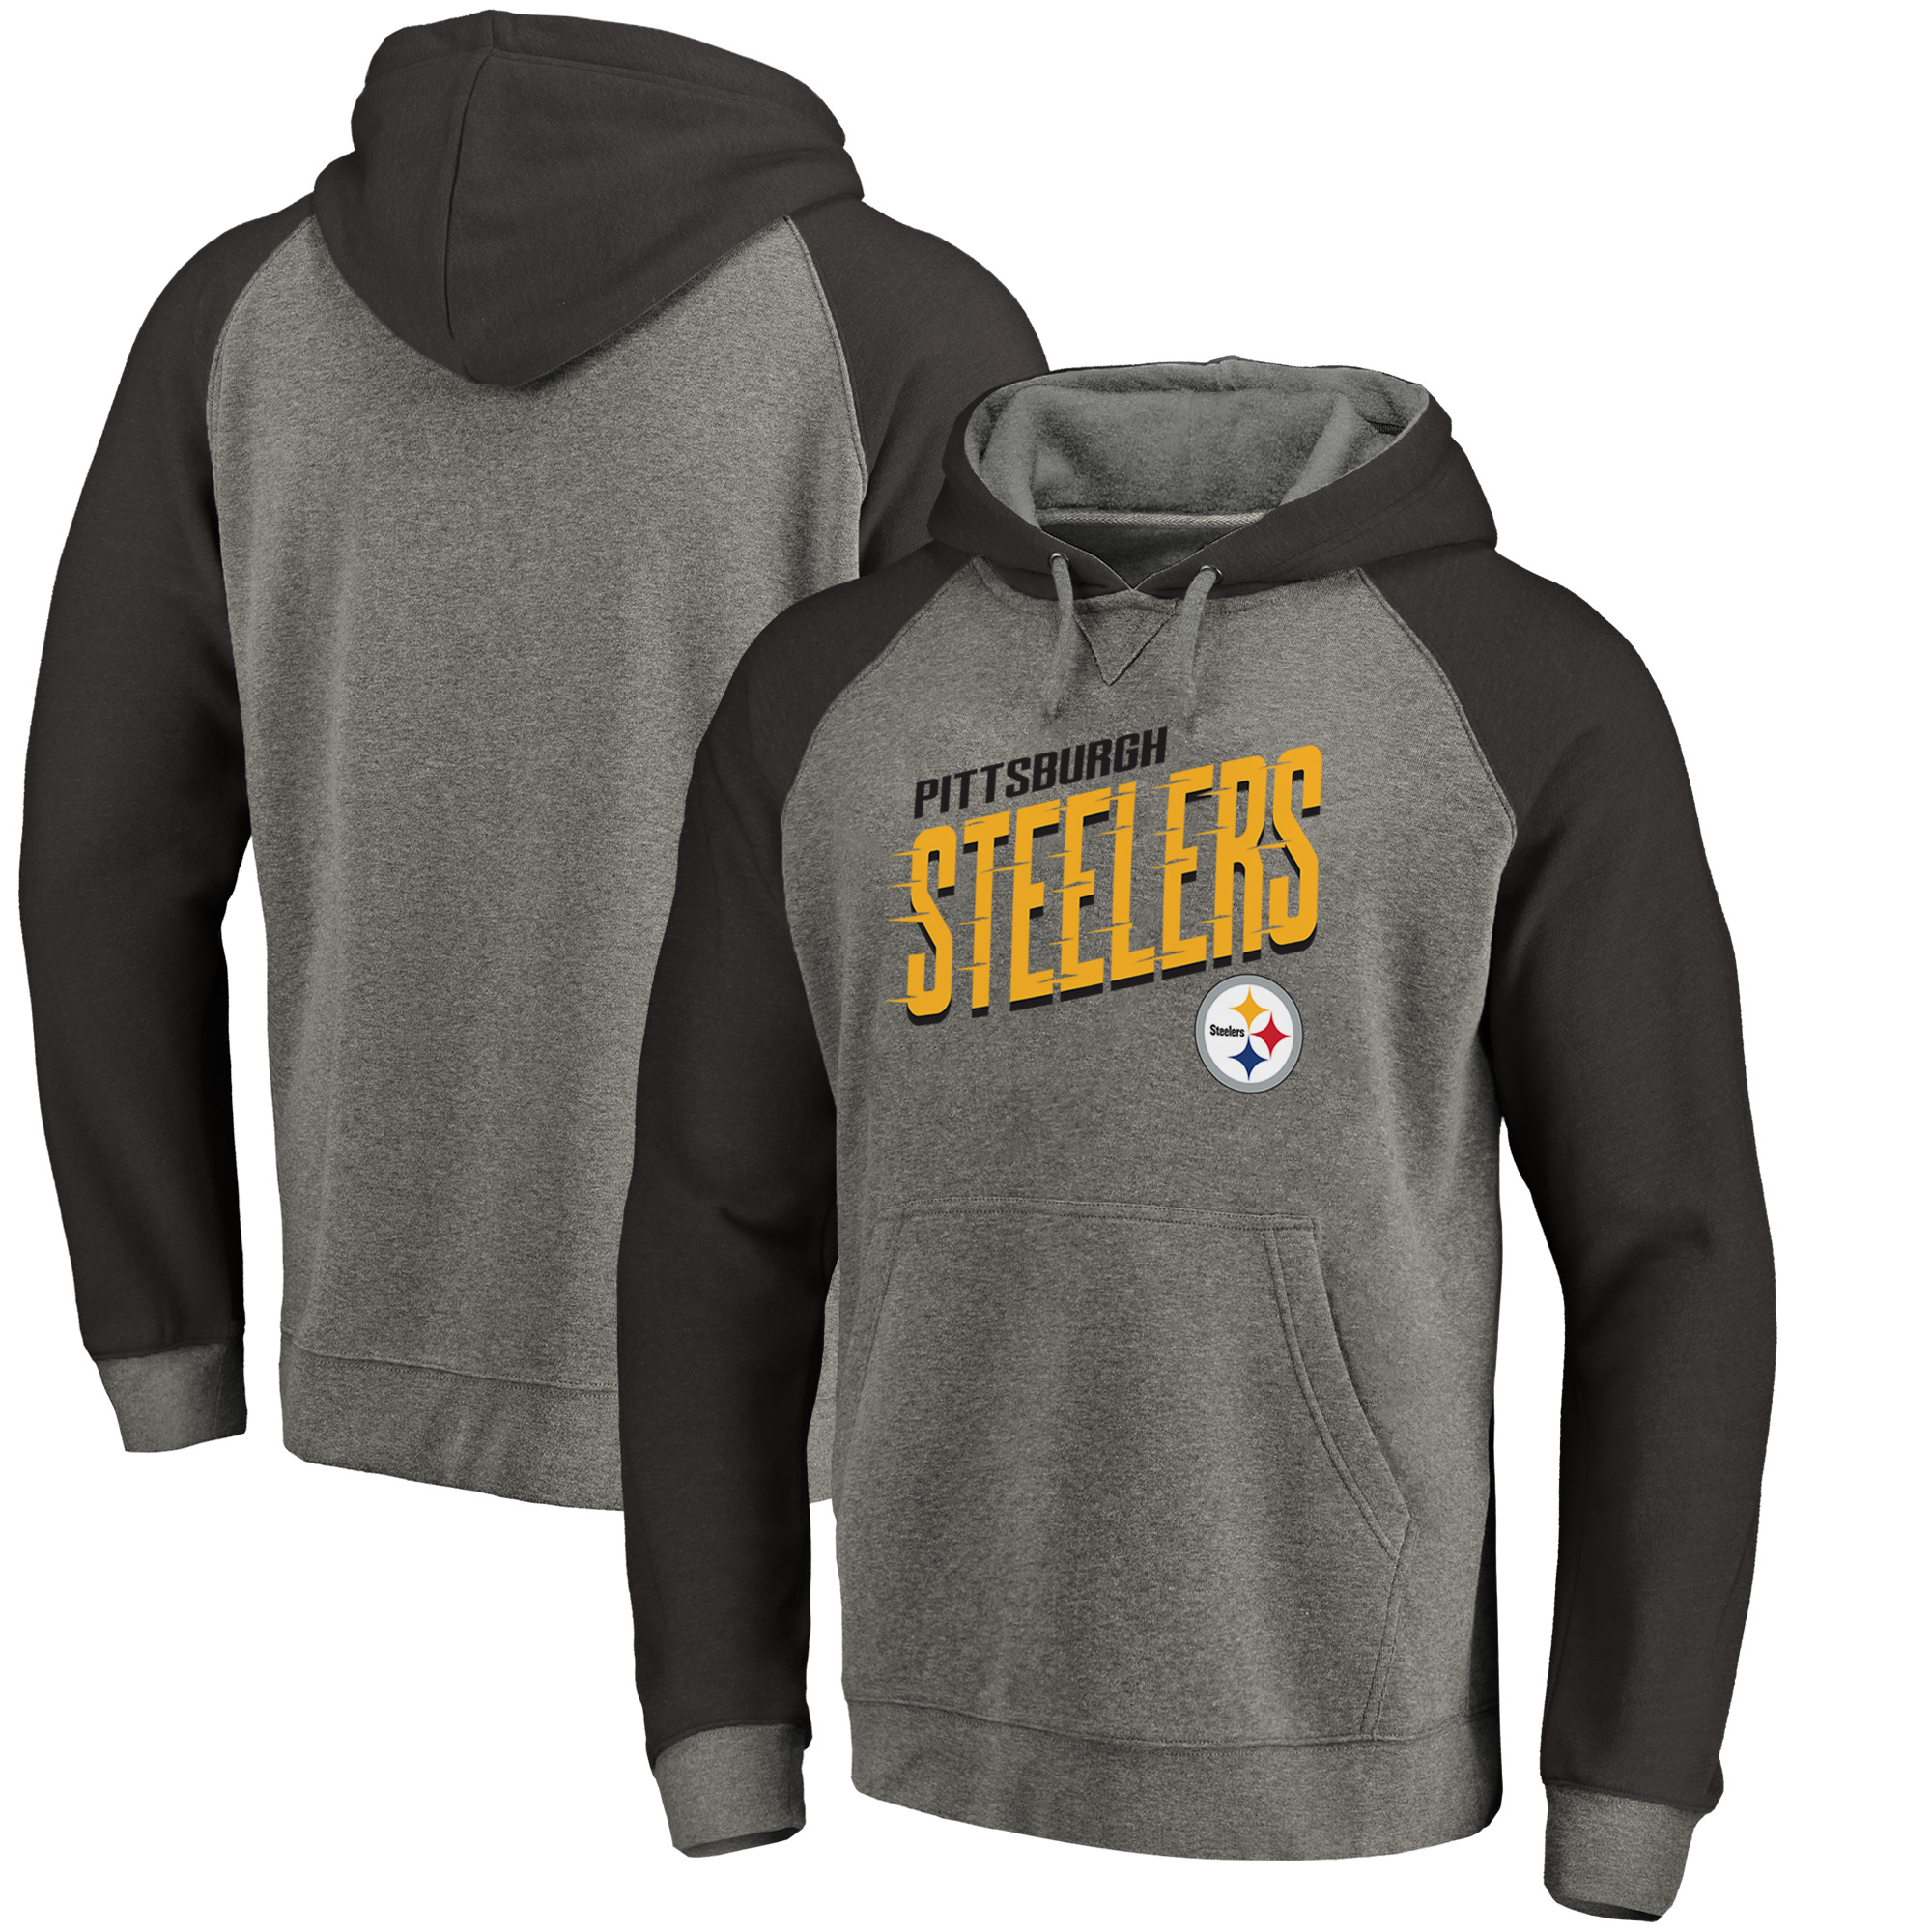 495046e63fc Pittsburgh Steelers Team Shop - Walmart.com